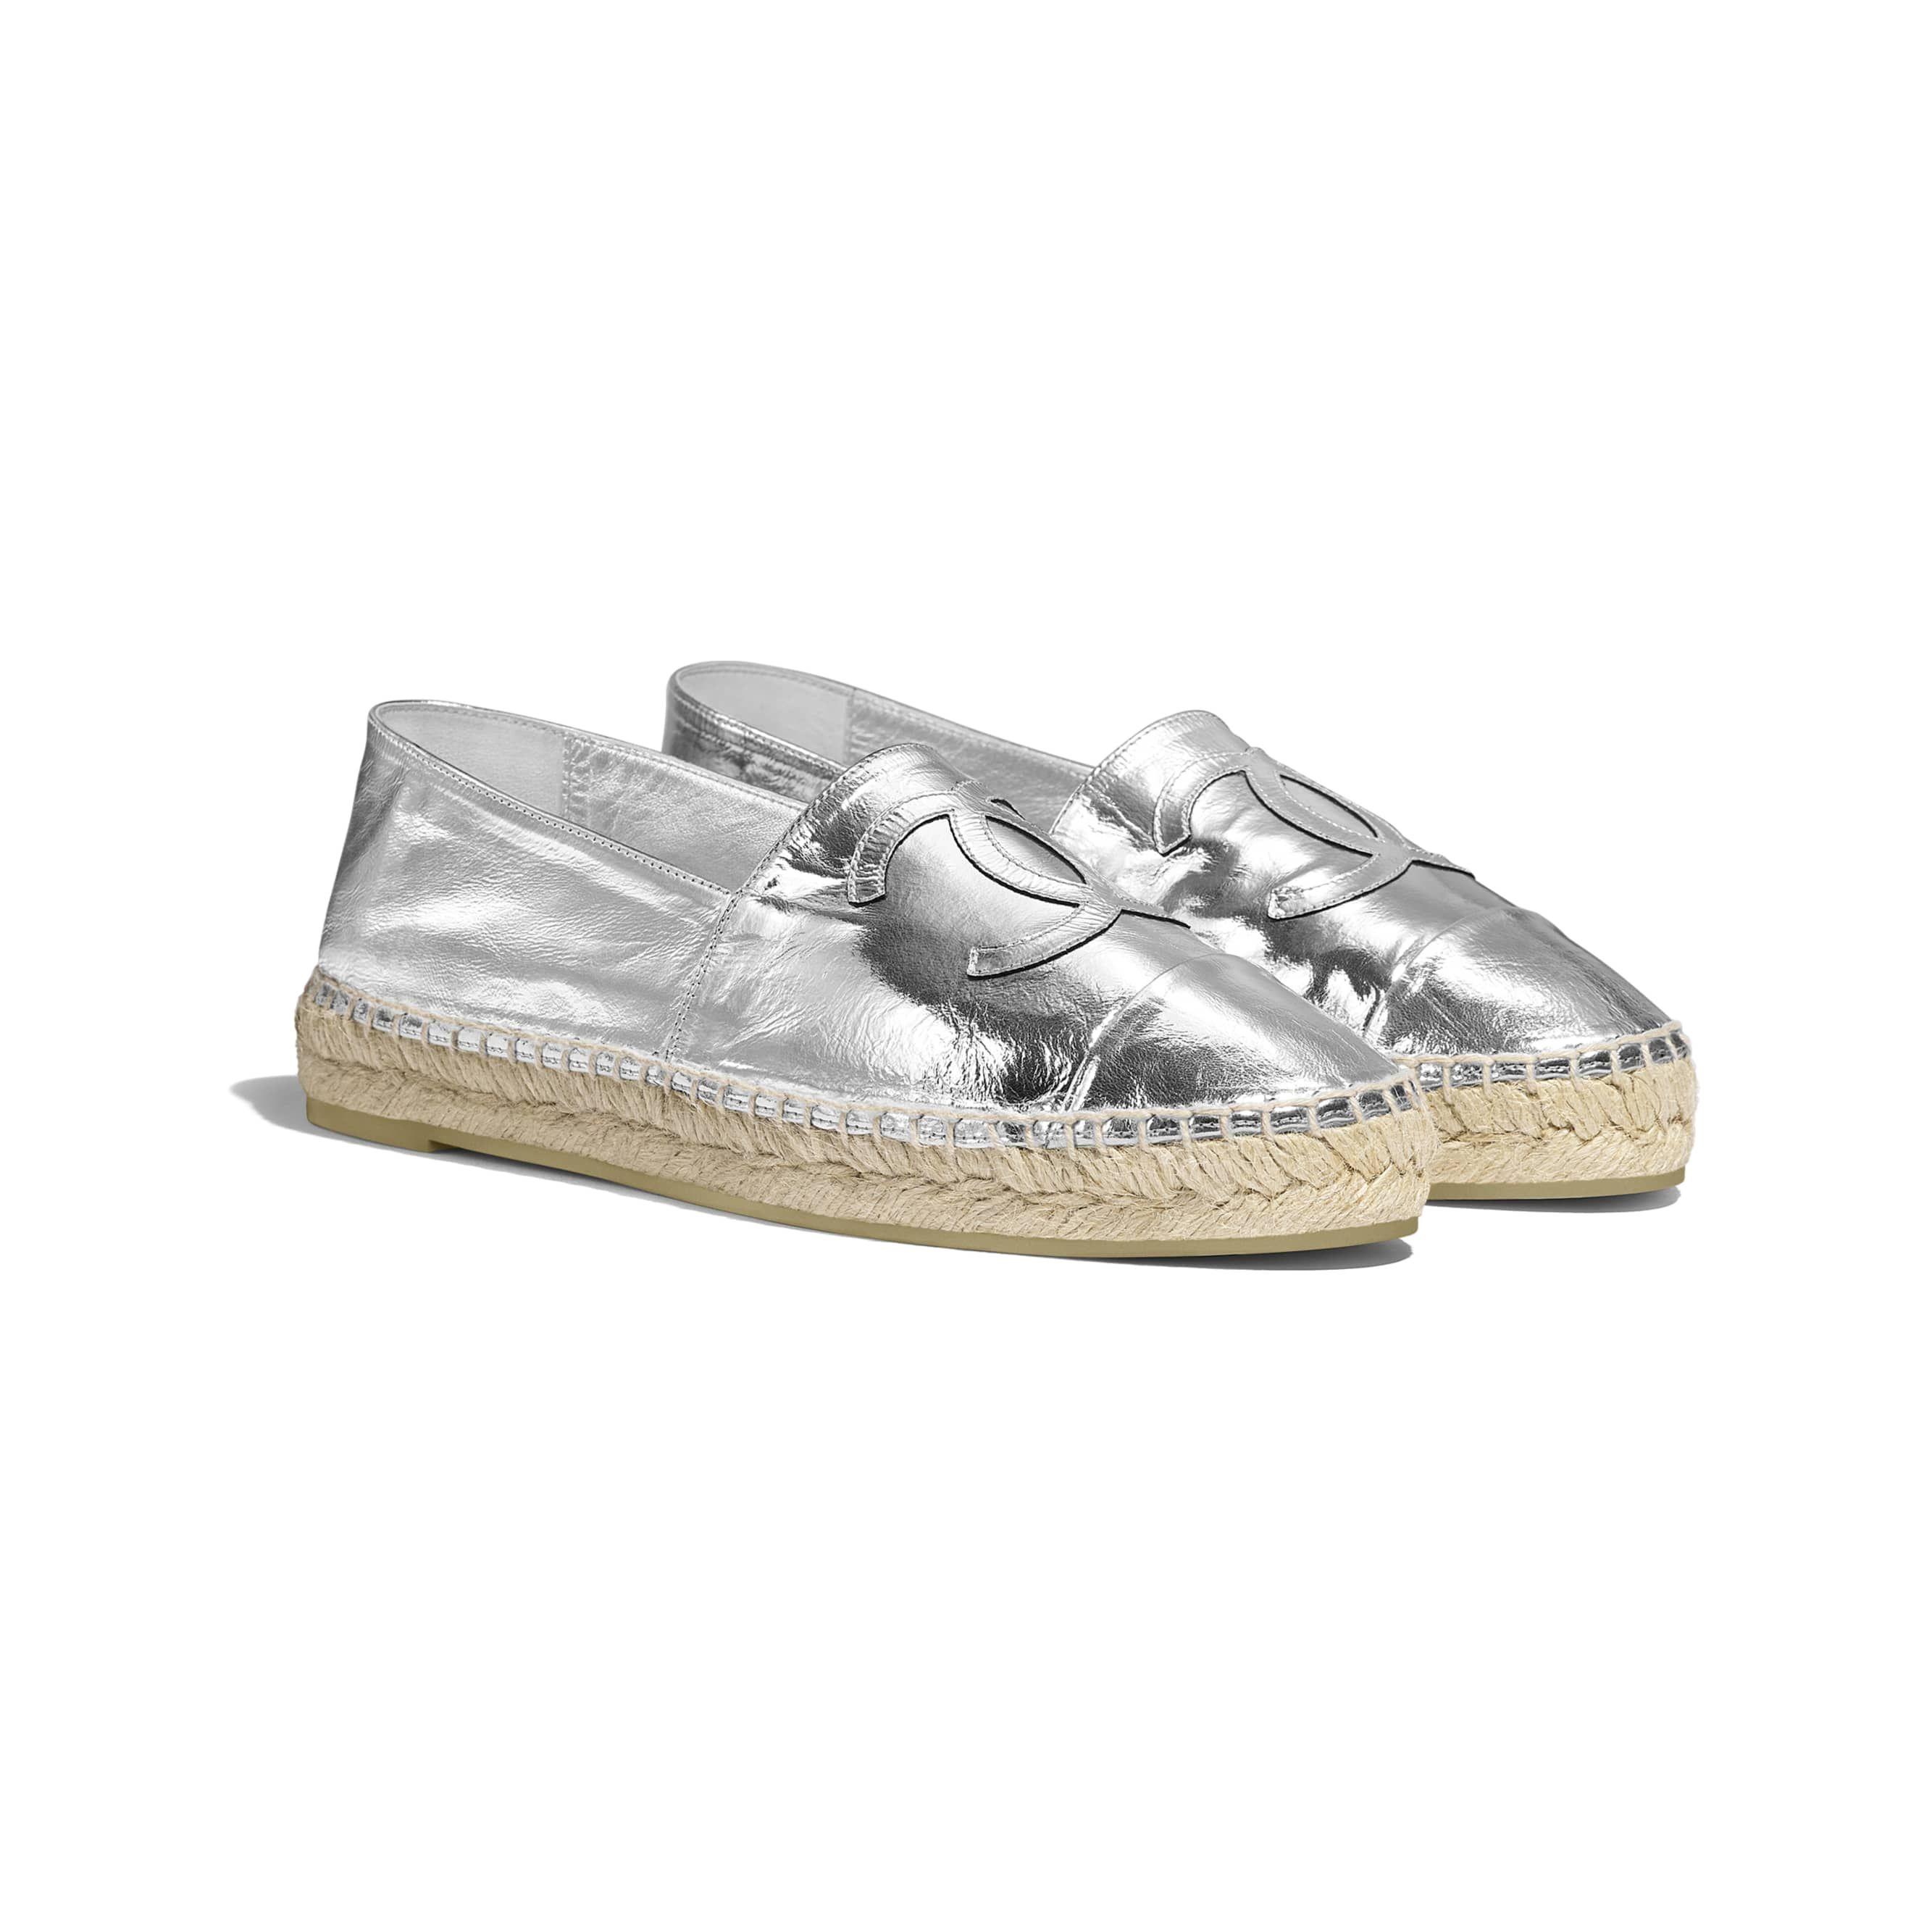 Chanel - Cruise 2018/19   Silver